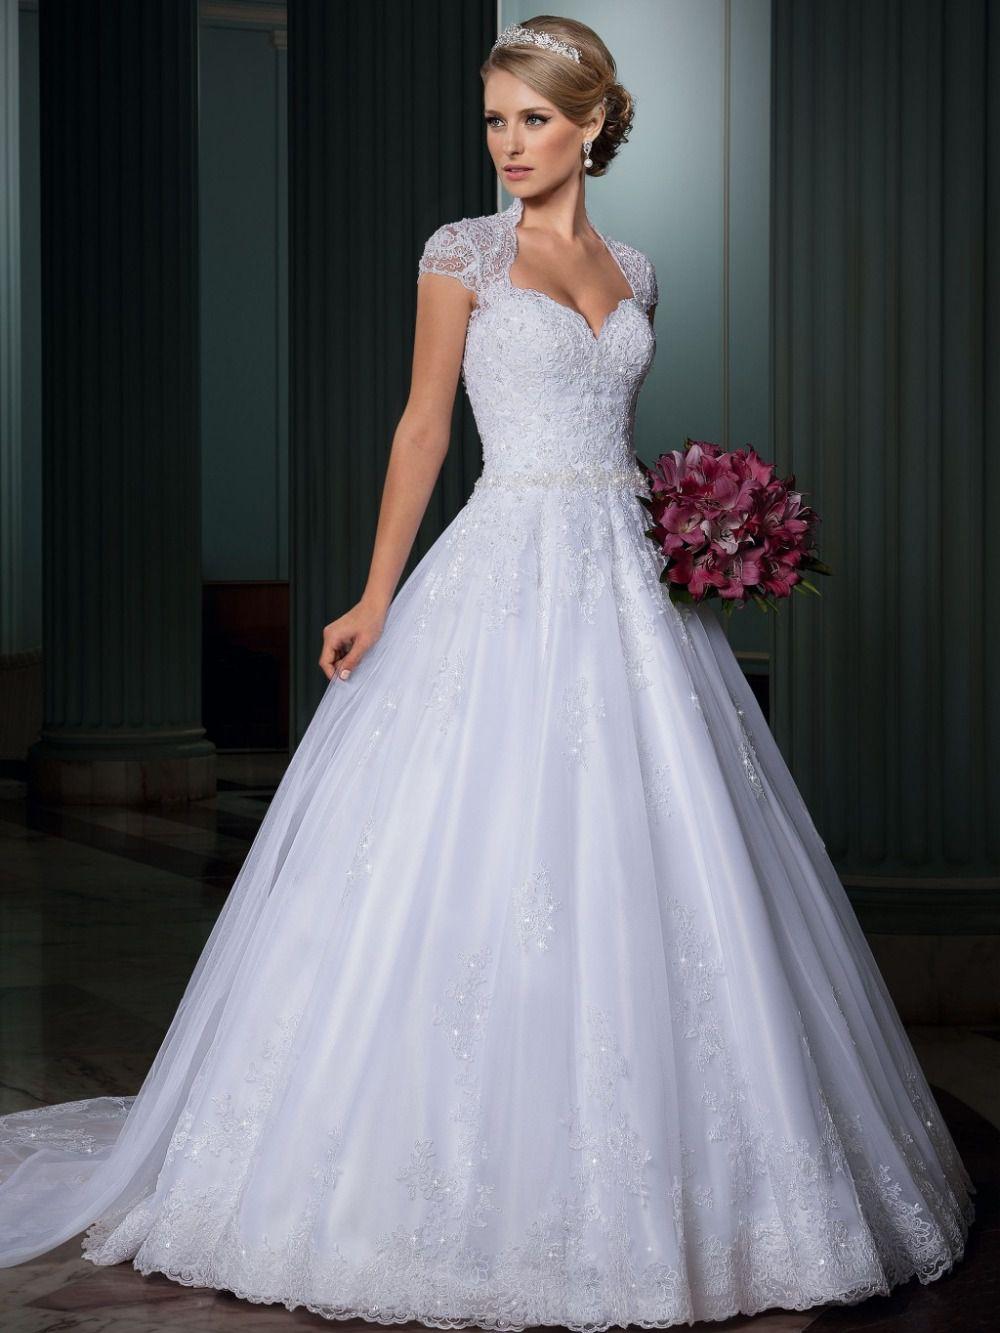 Vestido-de-noiva-Vestido-de-casamento-Vestido-traseira-aberta-sexy-Vestido-de-casamento-cauda-destacável-Vestido